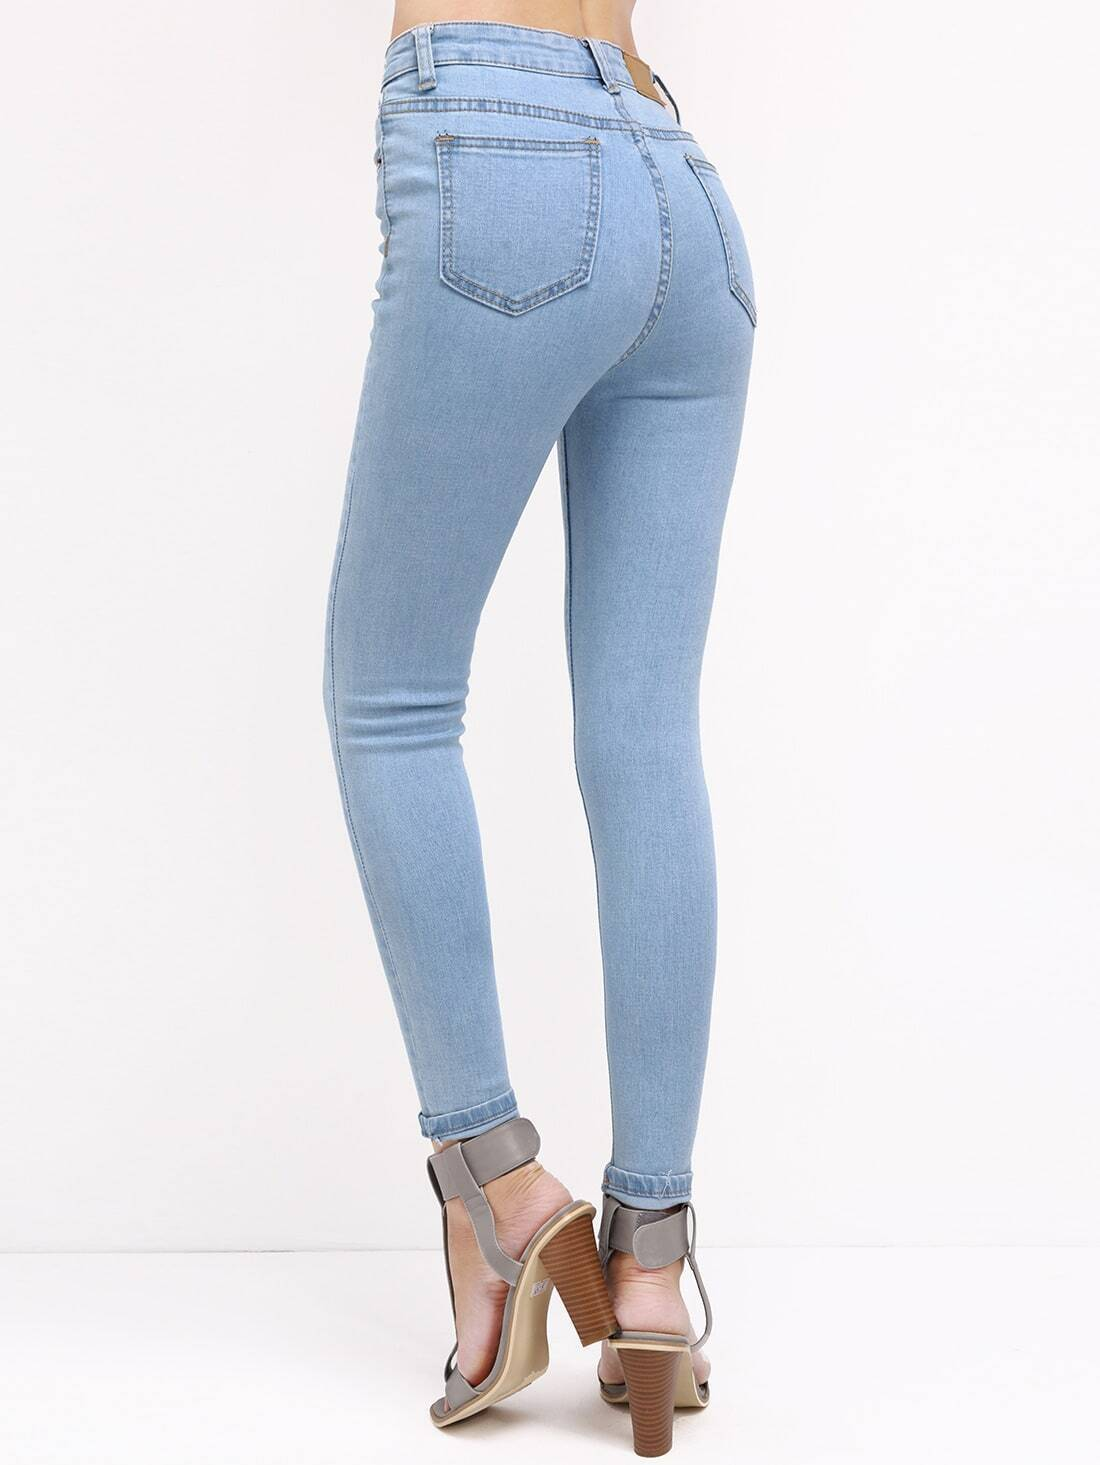 pantalon en denim d chir bleu french shein sheinside. Black Bedroom Furniture Sets. Home Design Ideas